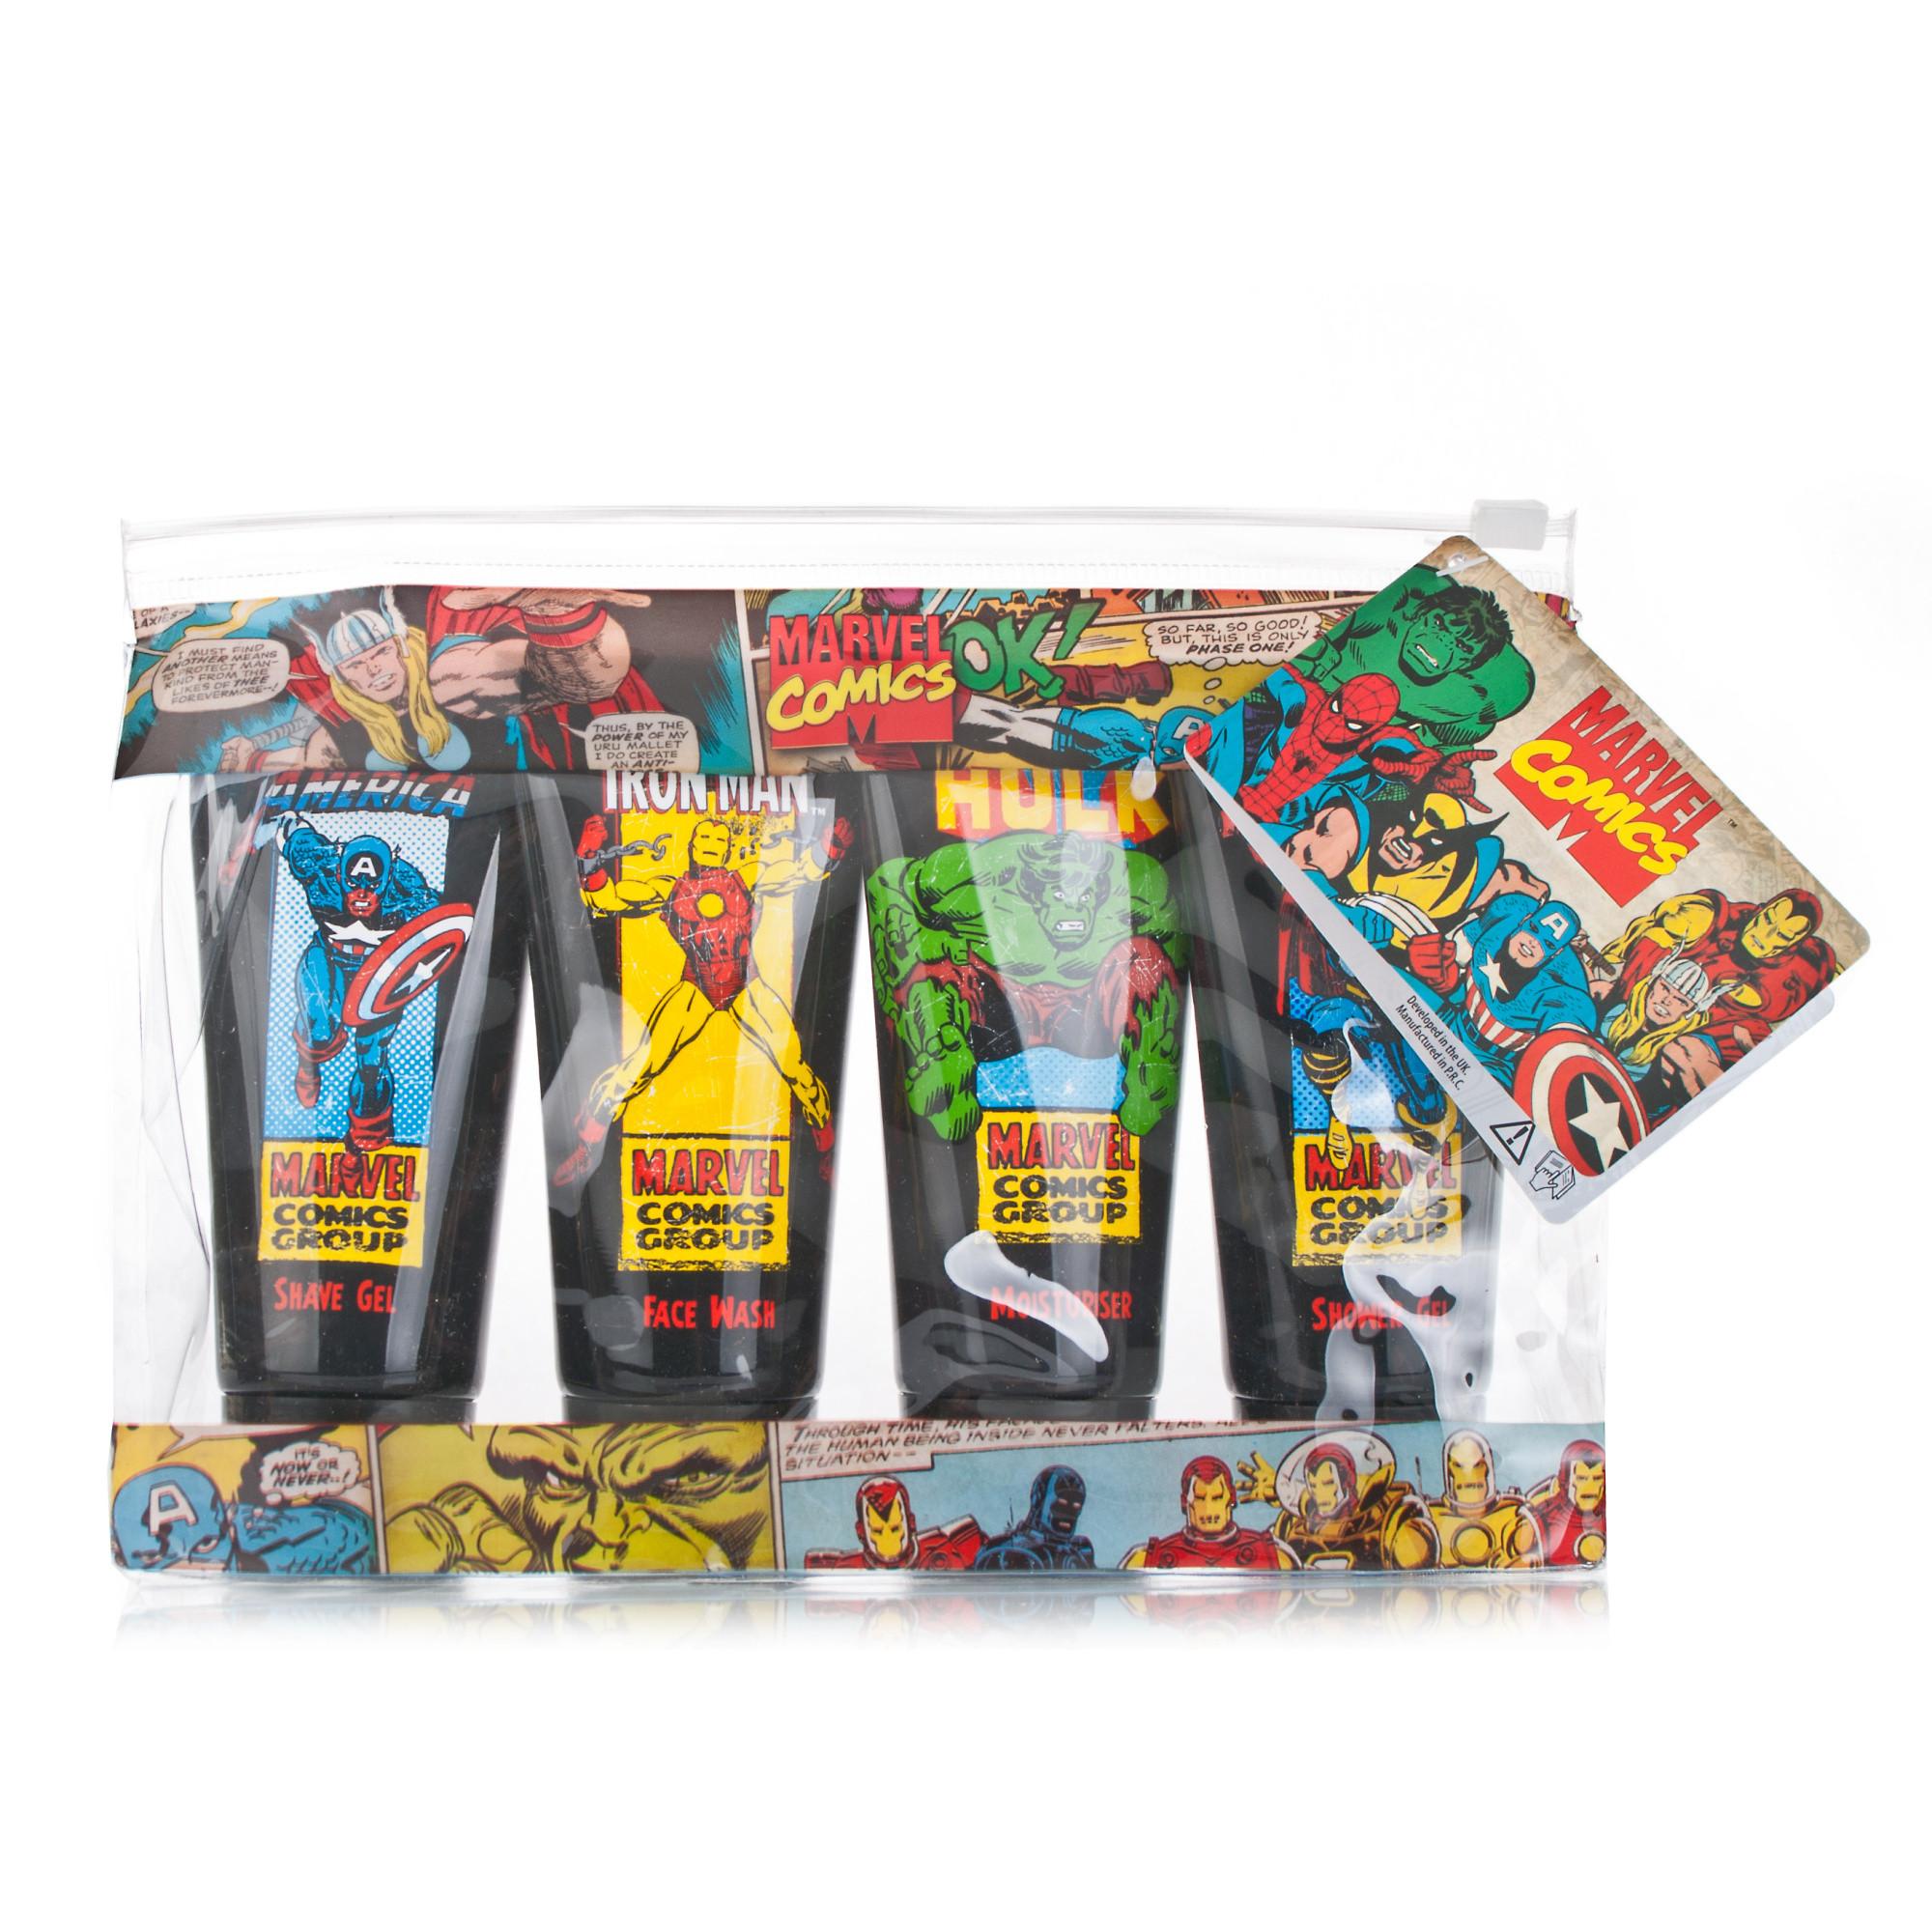 Marvel Baby Gifts Uk : Marvel comic group travel bag gift set chemist direct